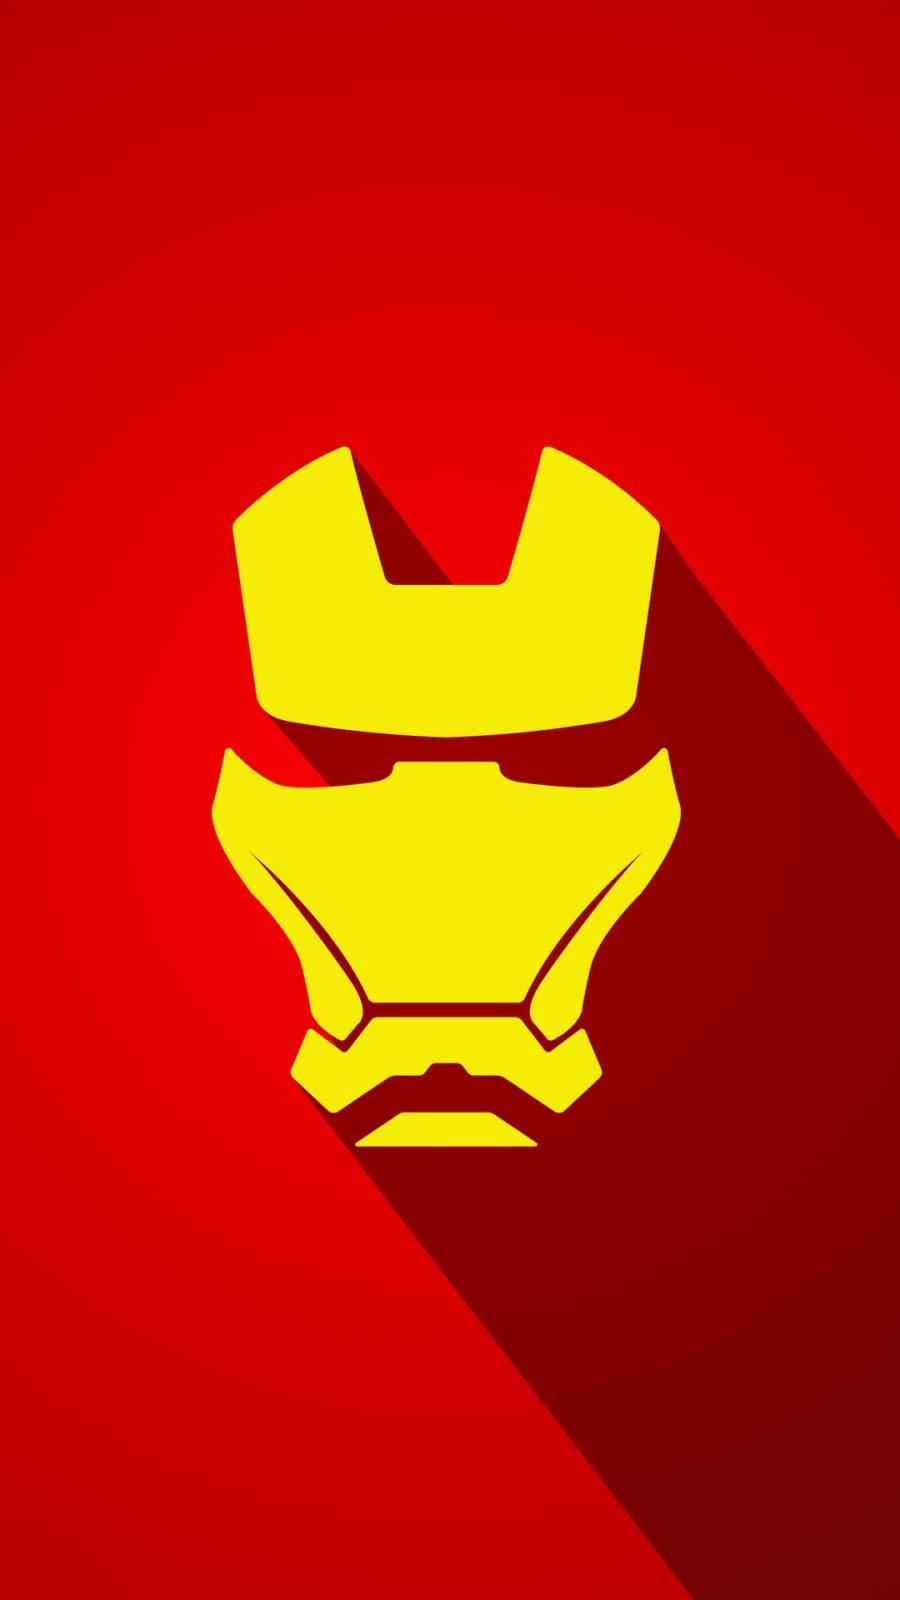 Iron Man Art Minimalist iPhone Wallpaper